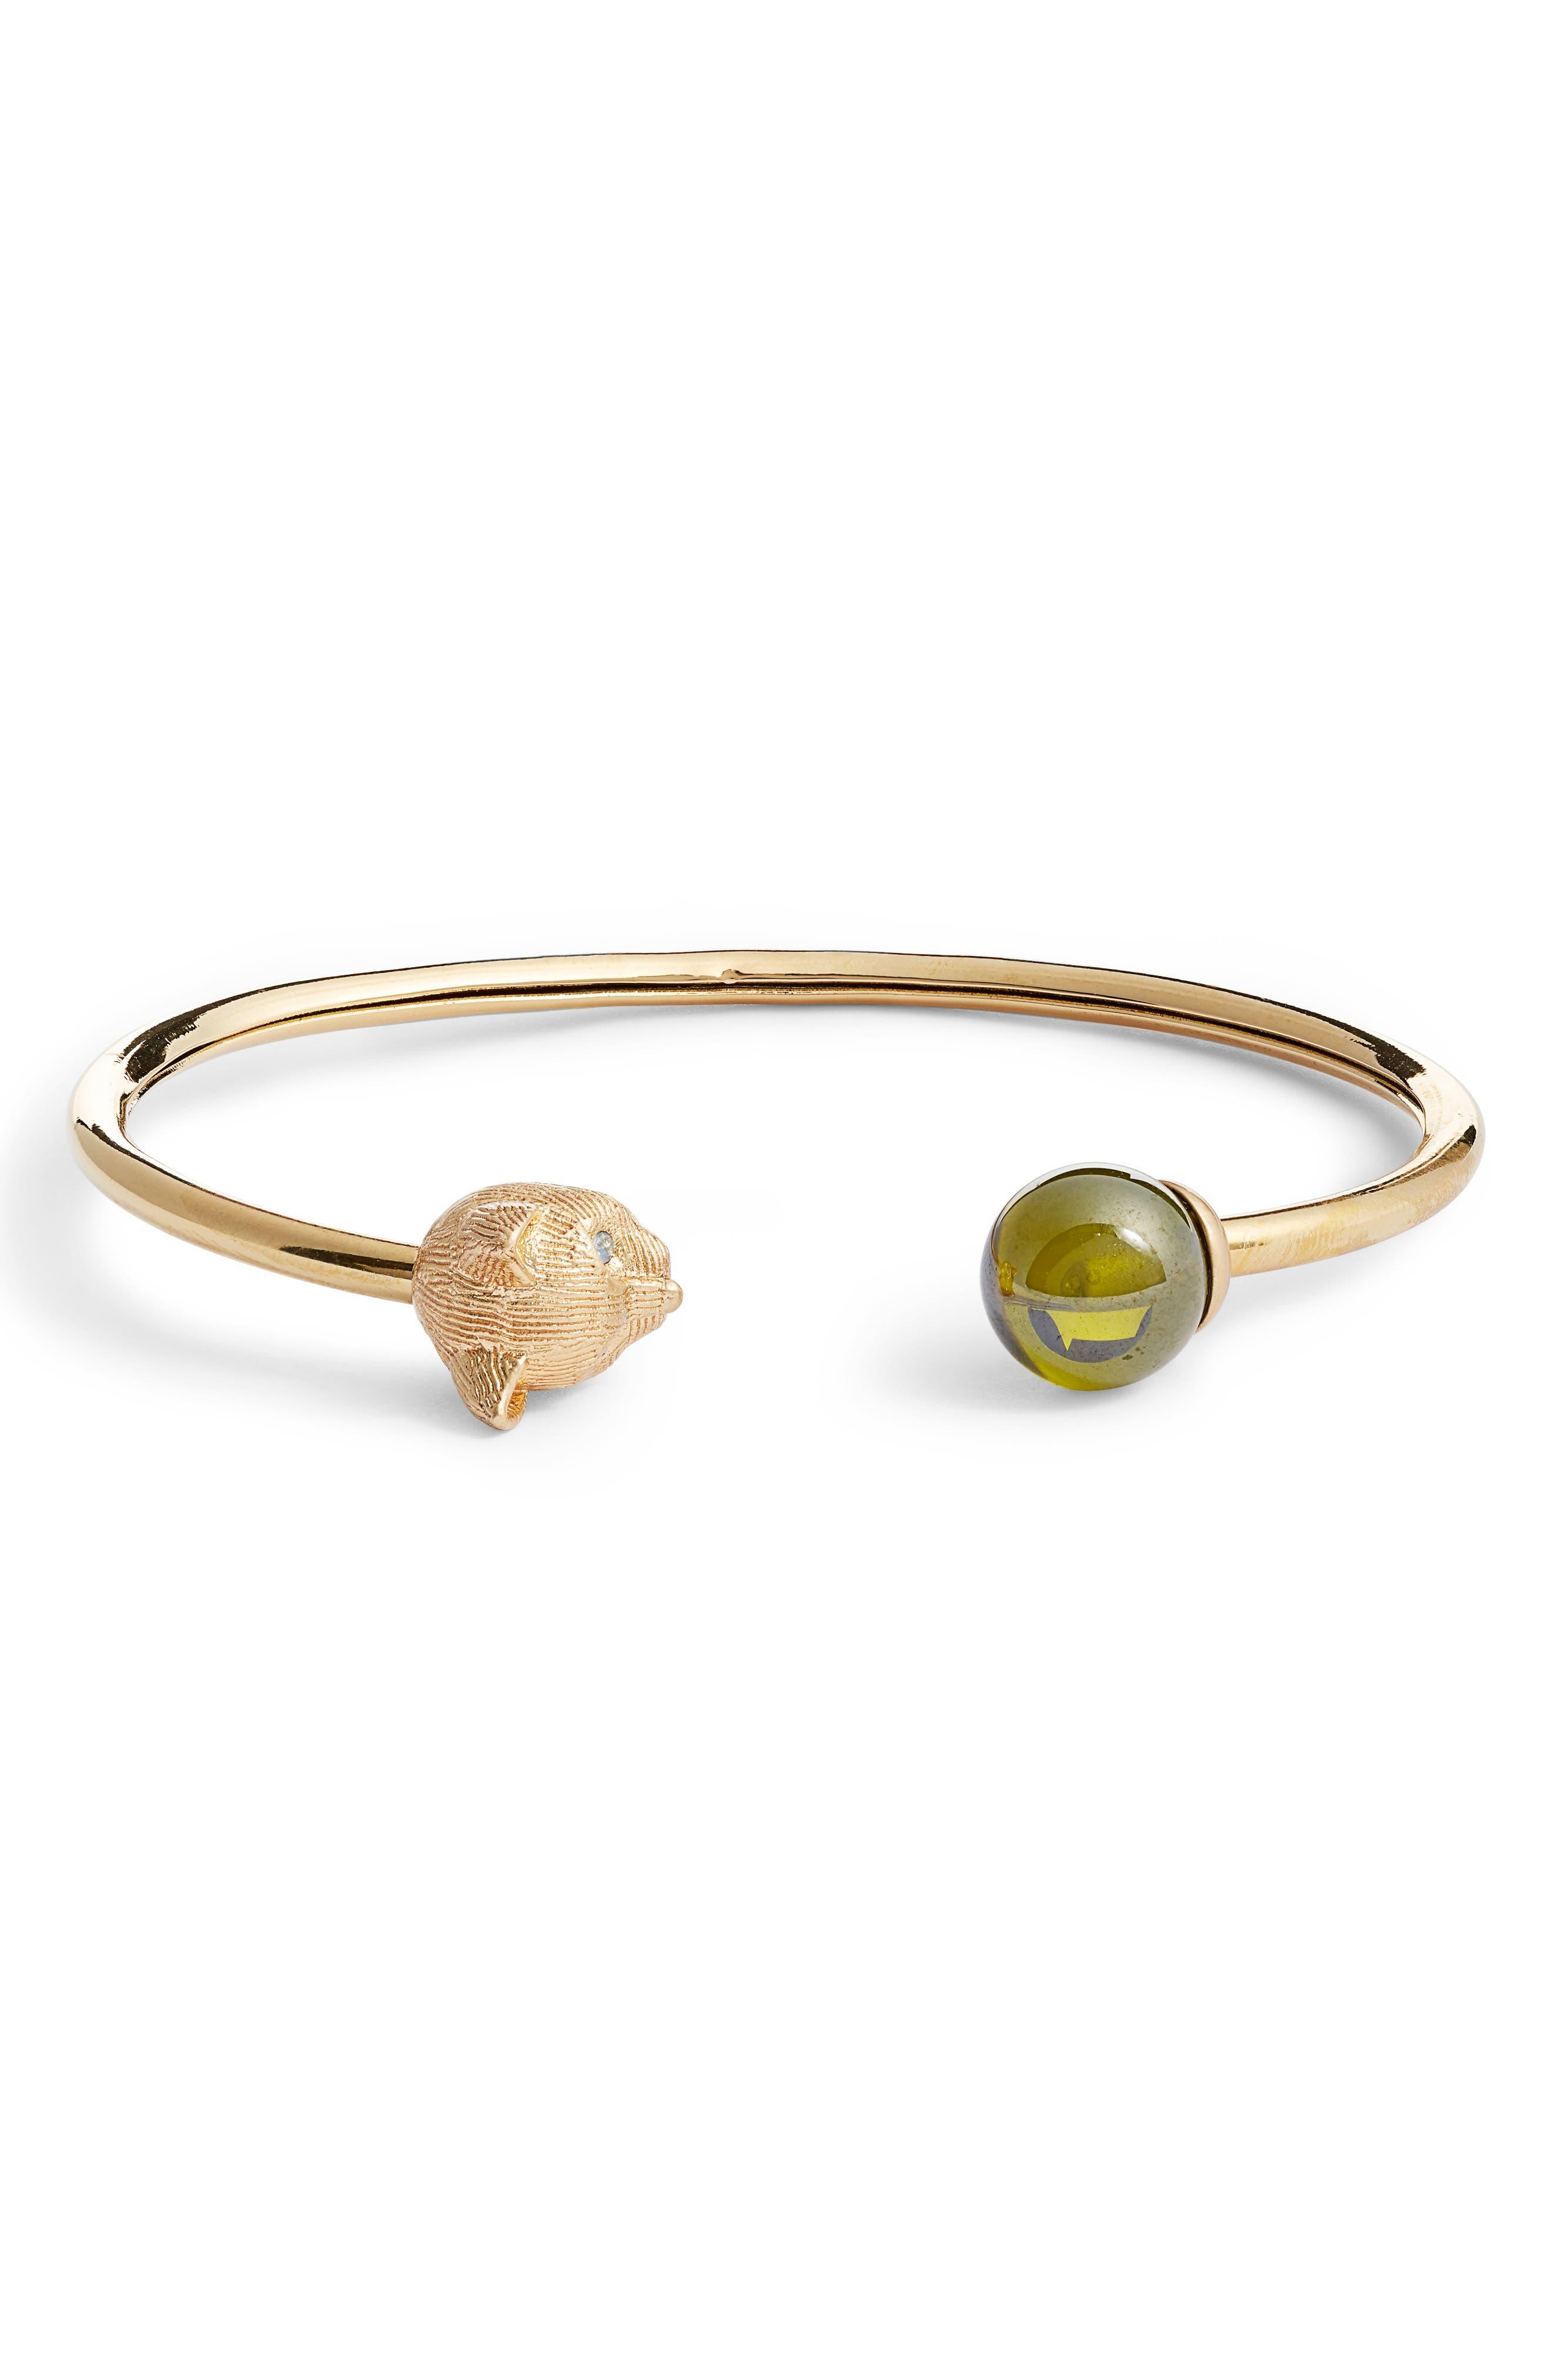 Kate Spade New York Jewelry house cat cuff bracelet